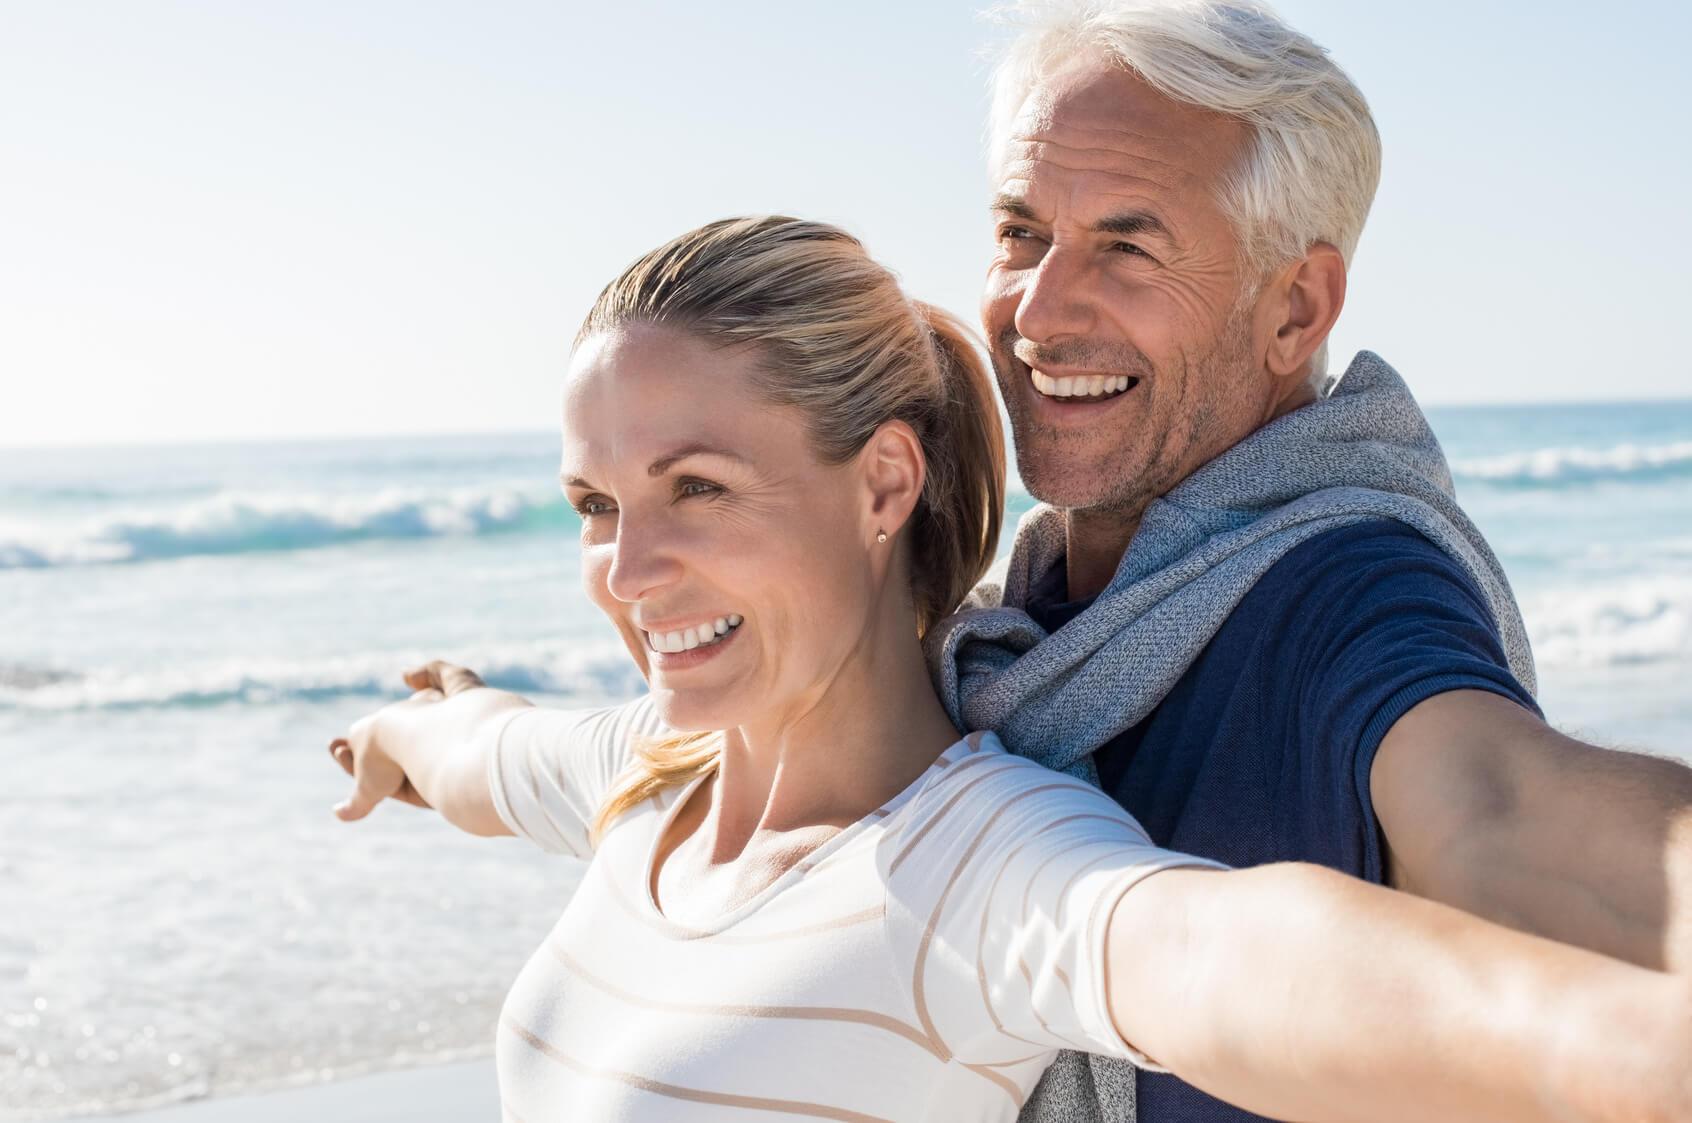 Couple with healthy teeth enjoying the coast on holiday